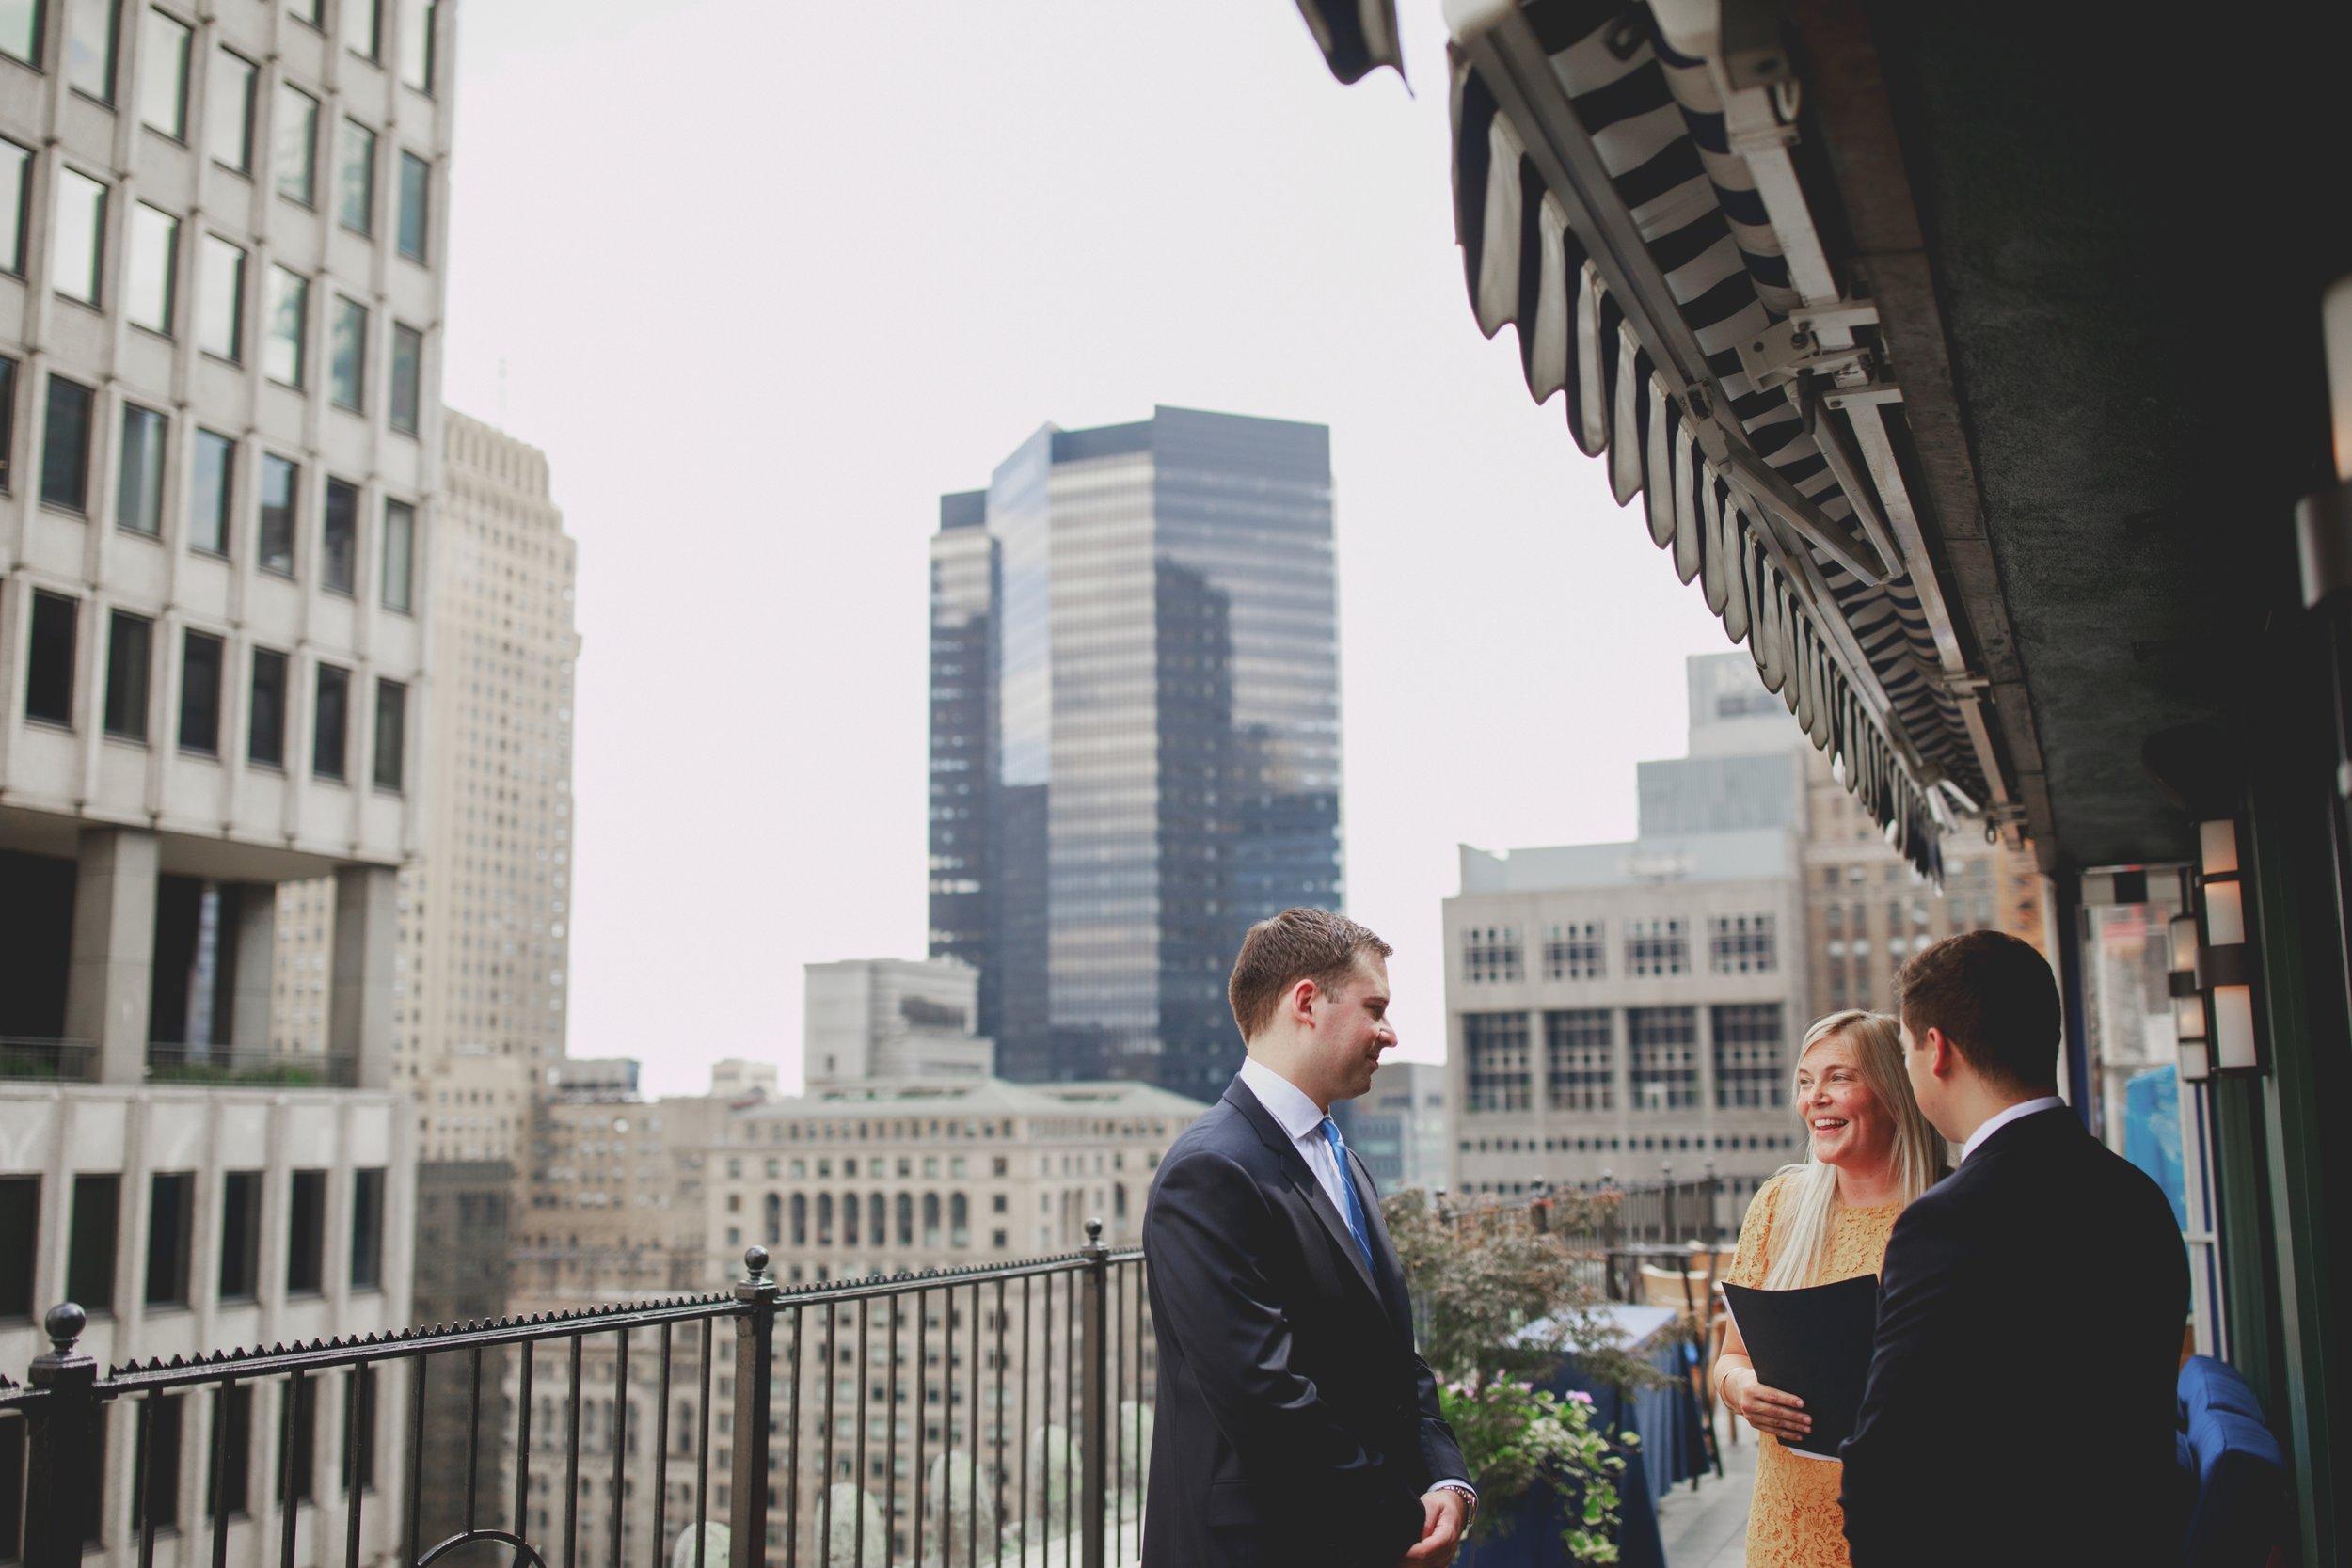 amanda_vanvels_new_york_lgbtq_gay_wedding_004.jpg